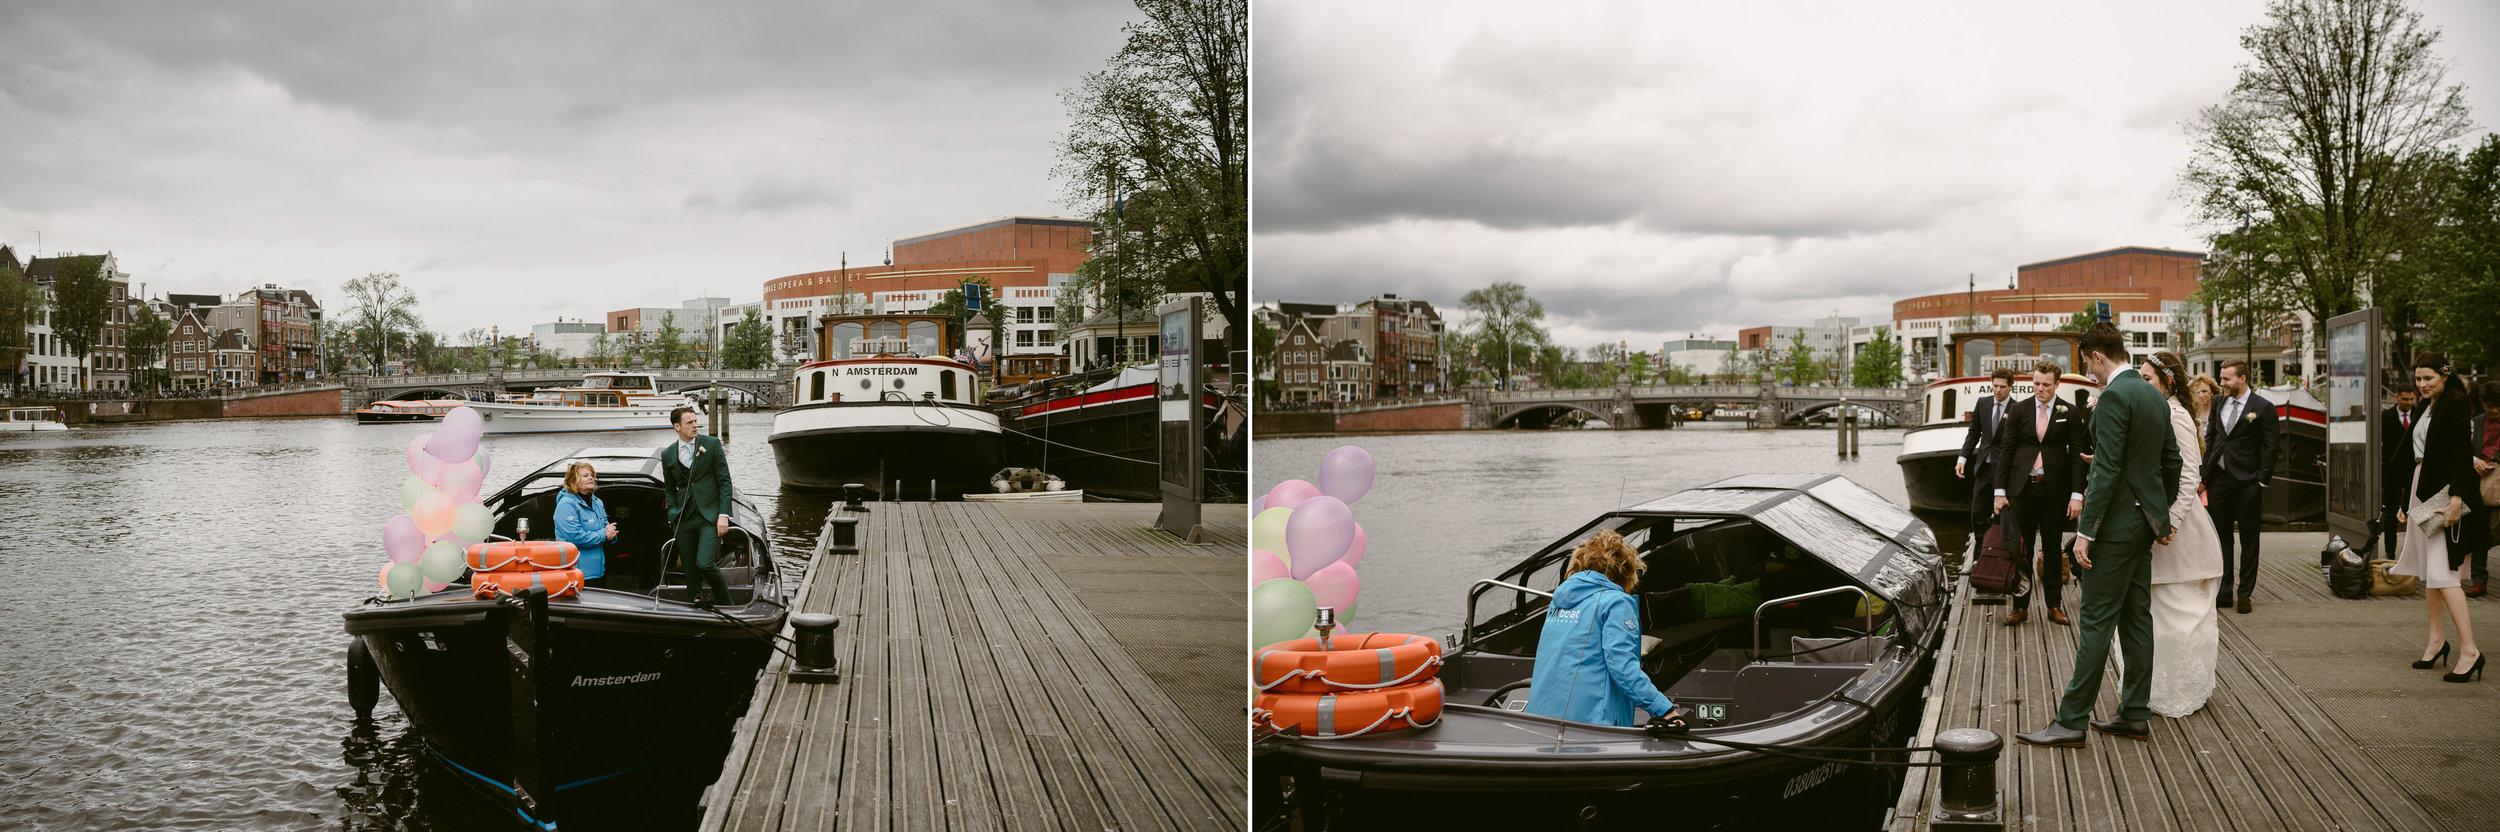 bruidsfotografie-amsterdam-utrecht-trouwfotograaf-mark-hadden-wedding-photography-Robin & Guus-094 copy.jpg